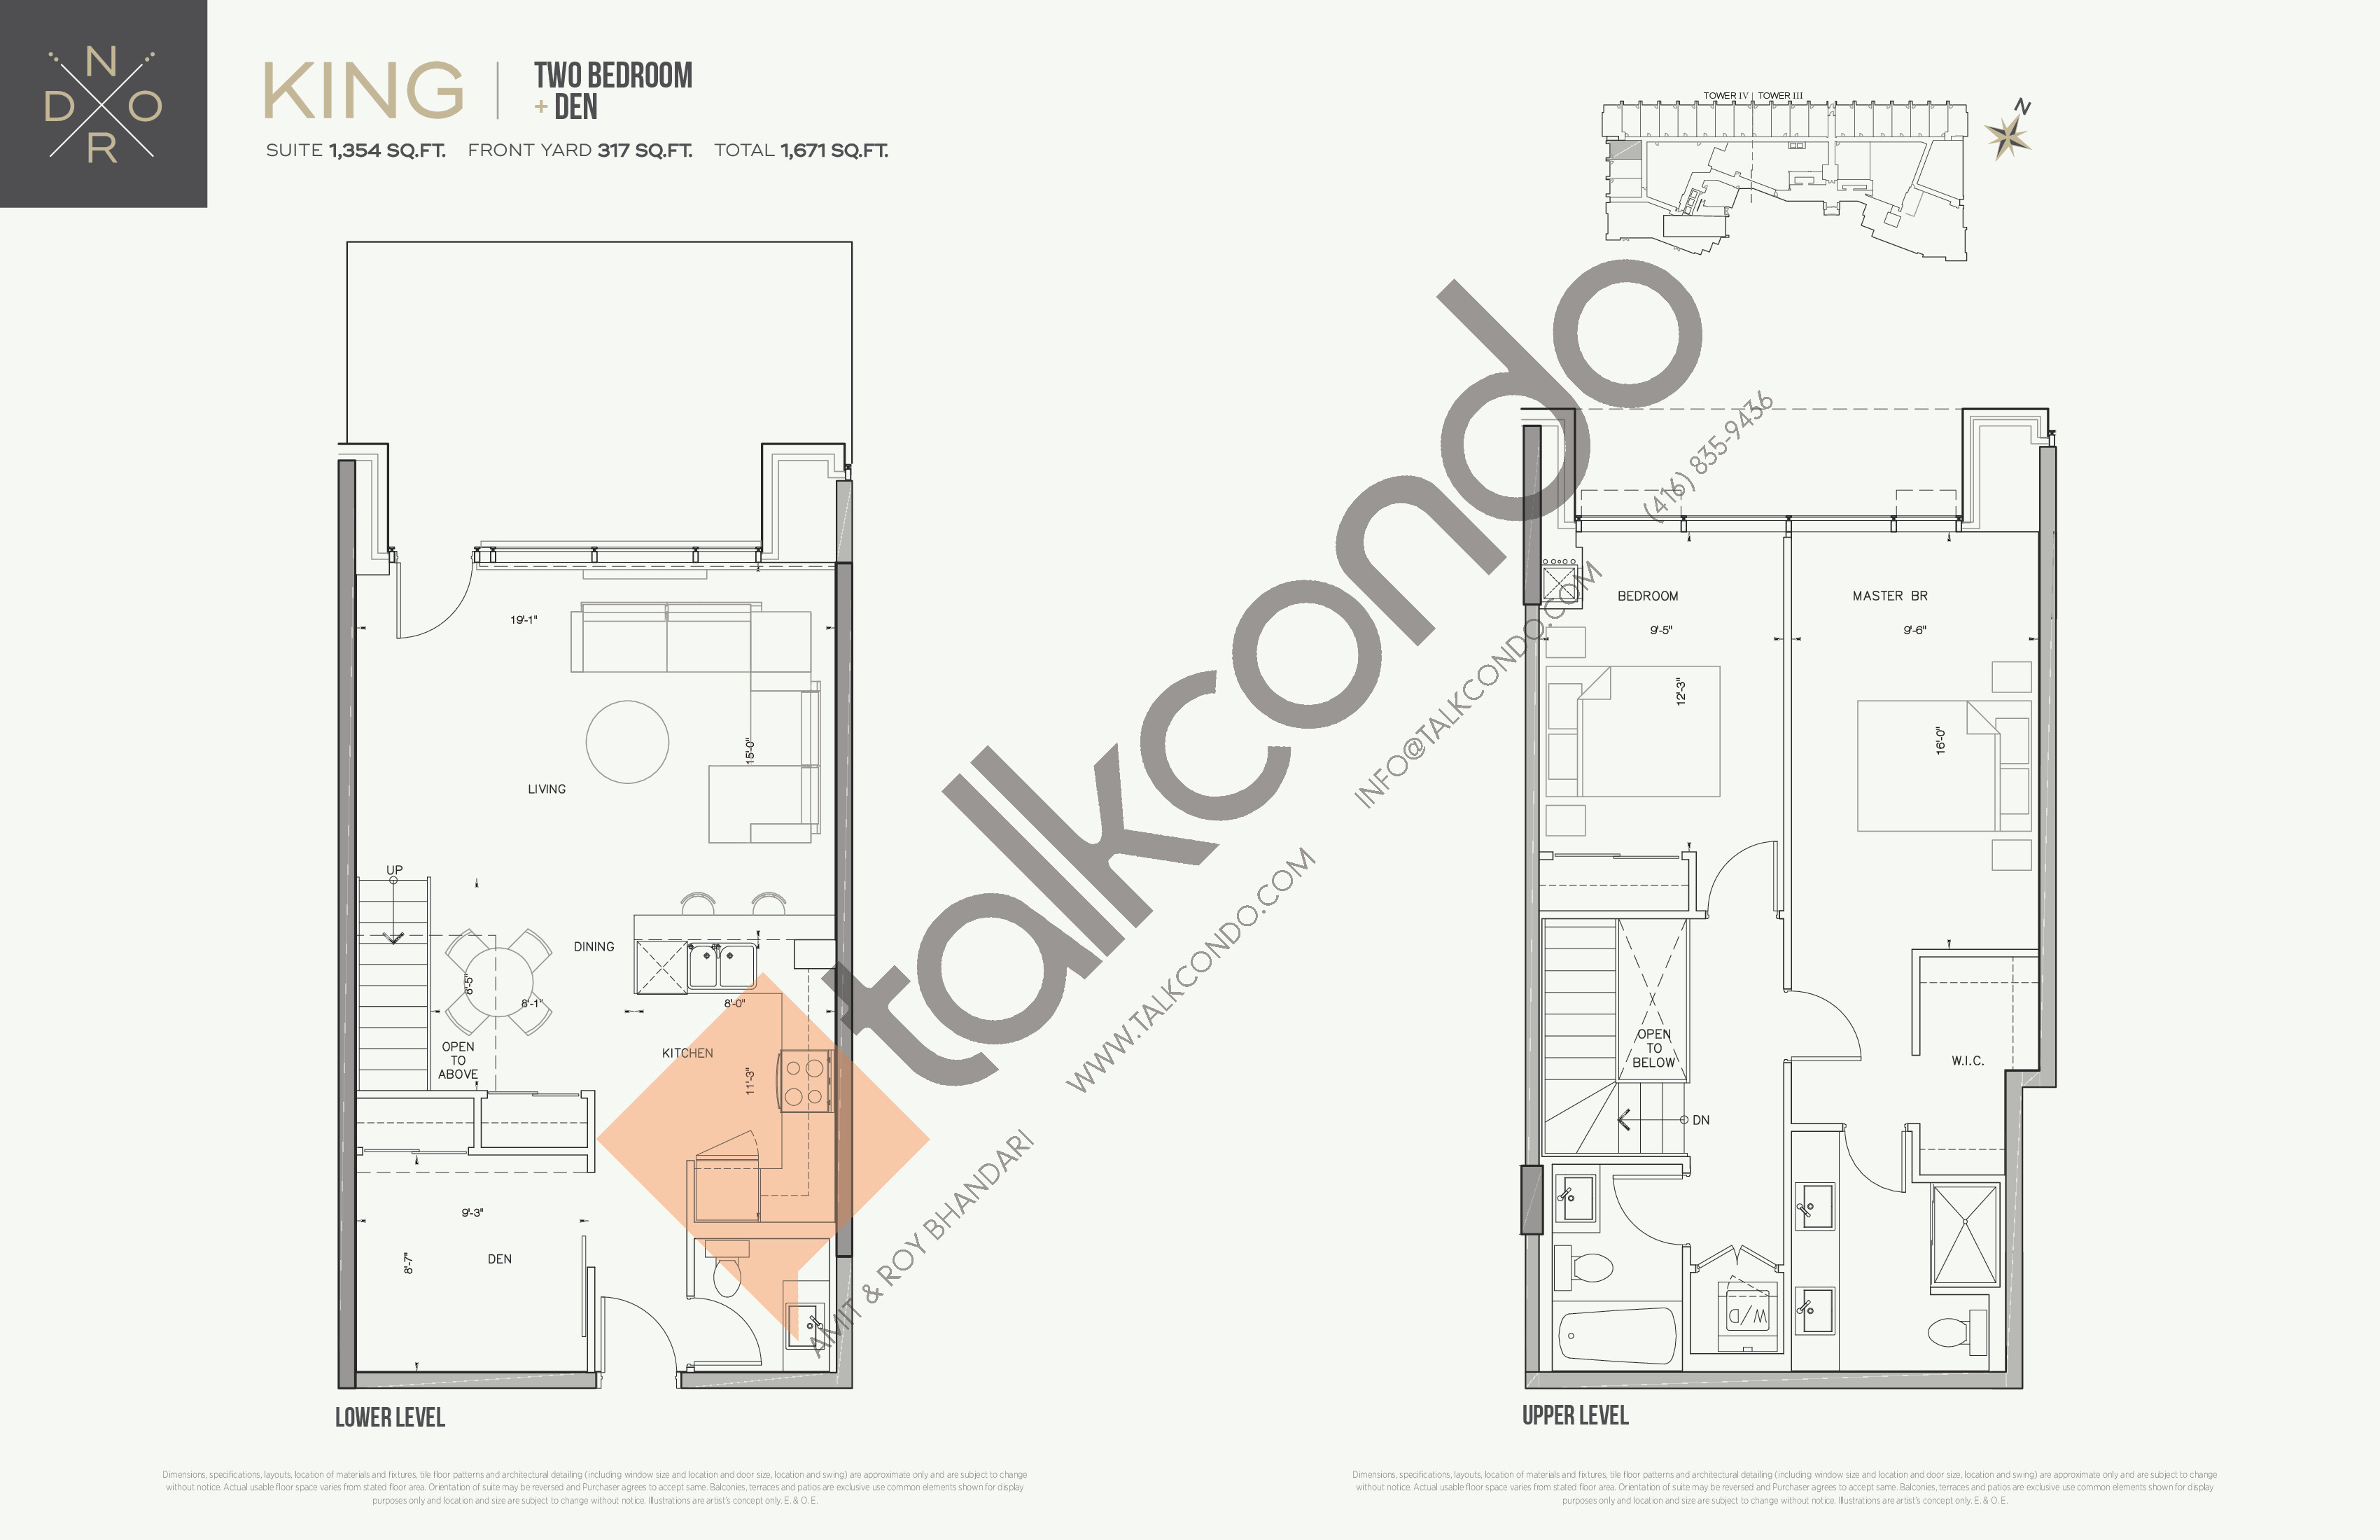 King Floor Plan at Nord West at Expo City Condos - 1354 sq.ft